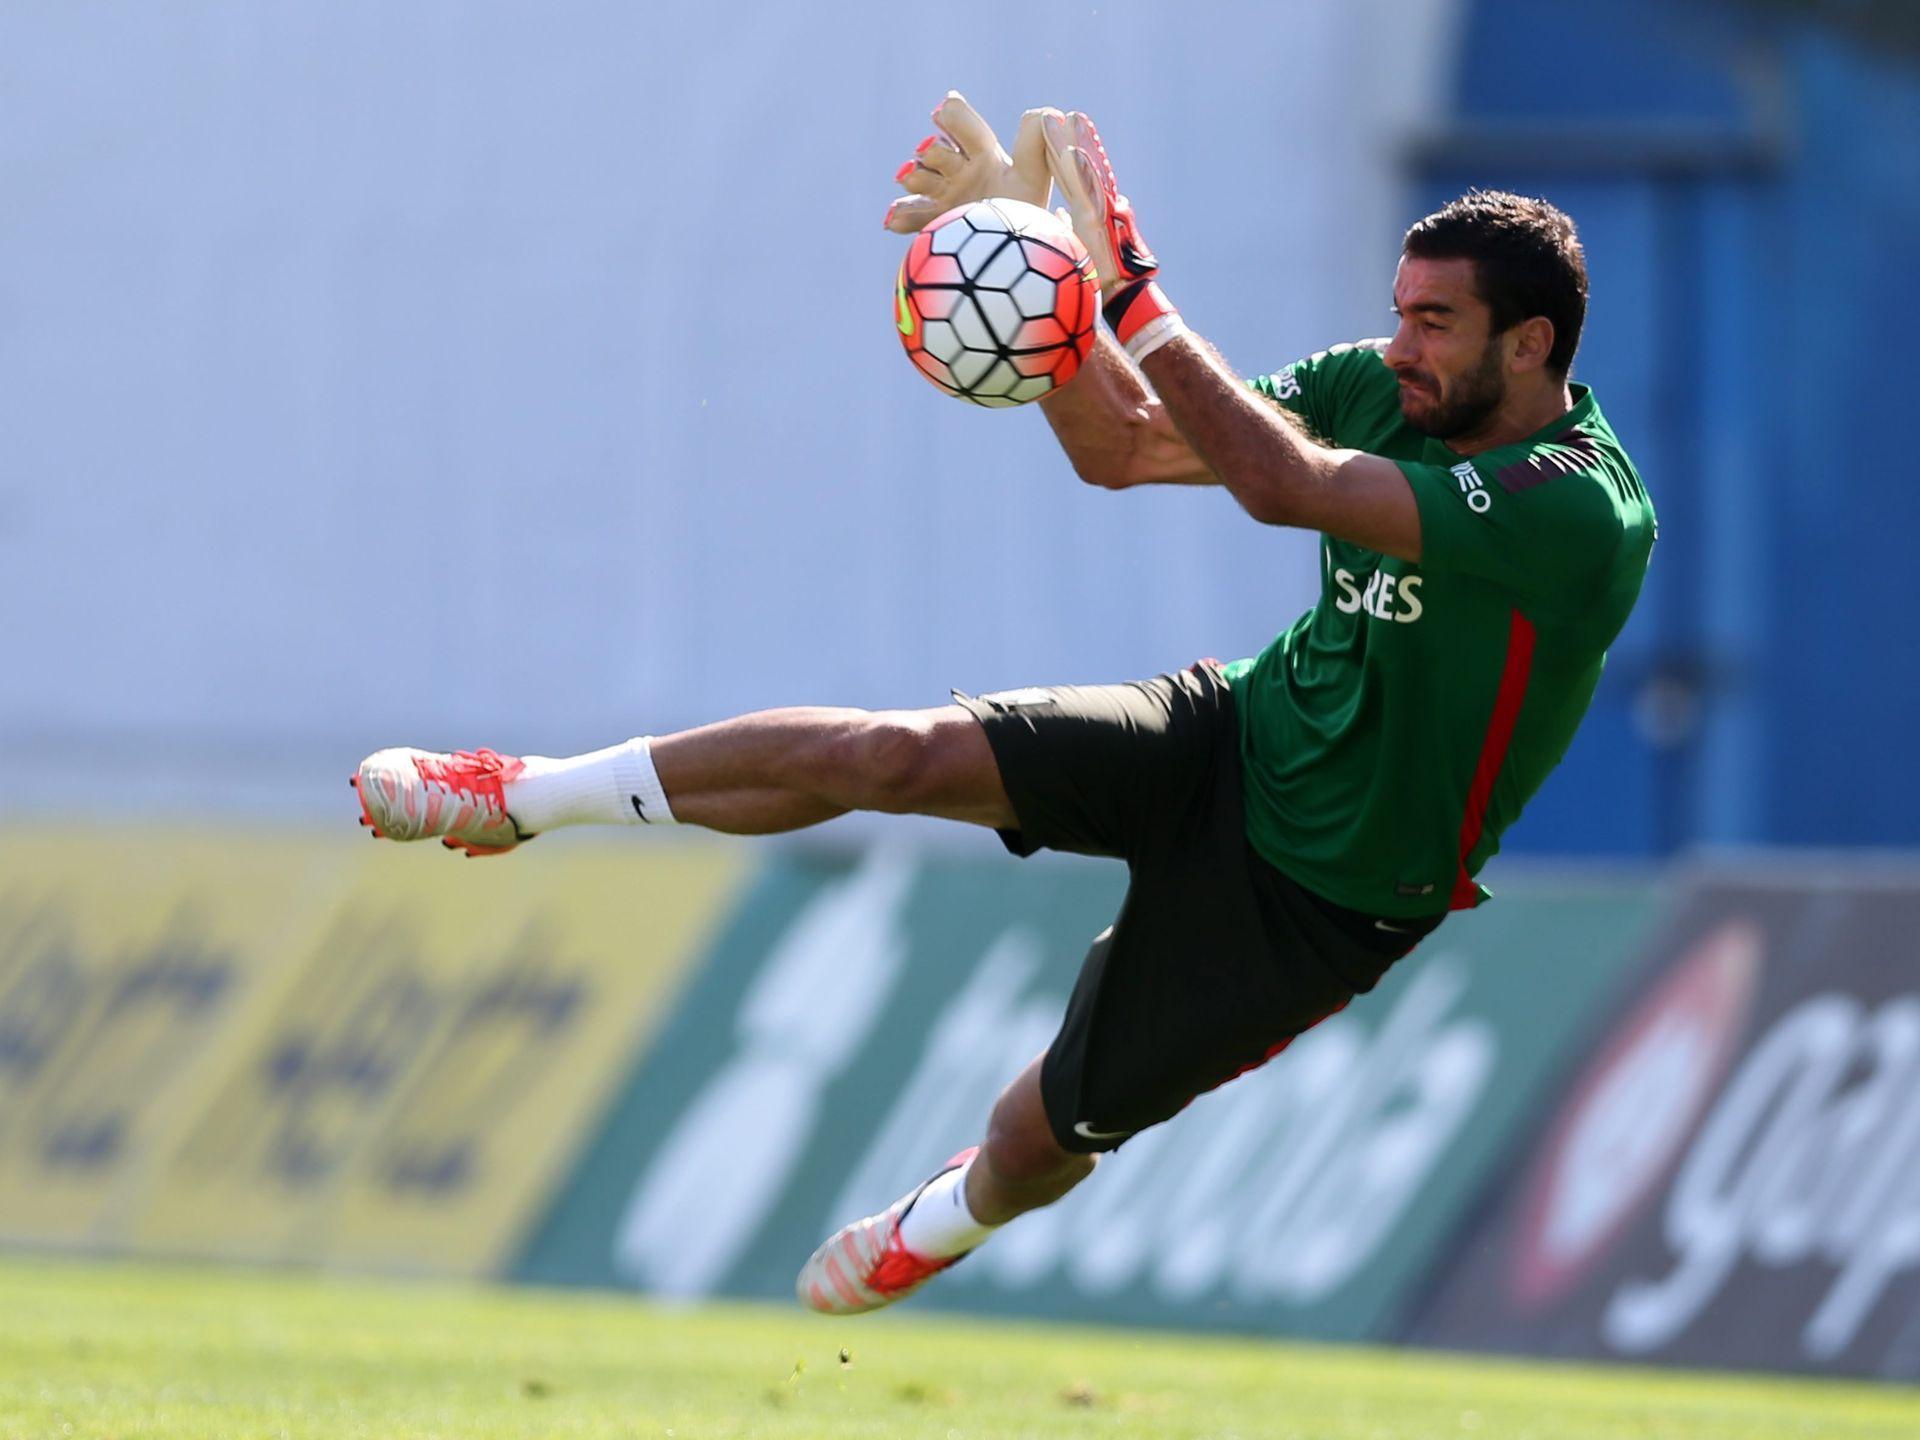 Portuguese national team soccer goalkeeper Rui Patricio